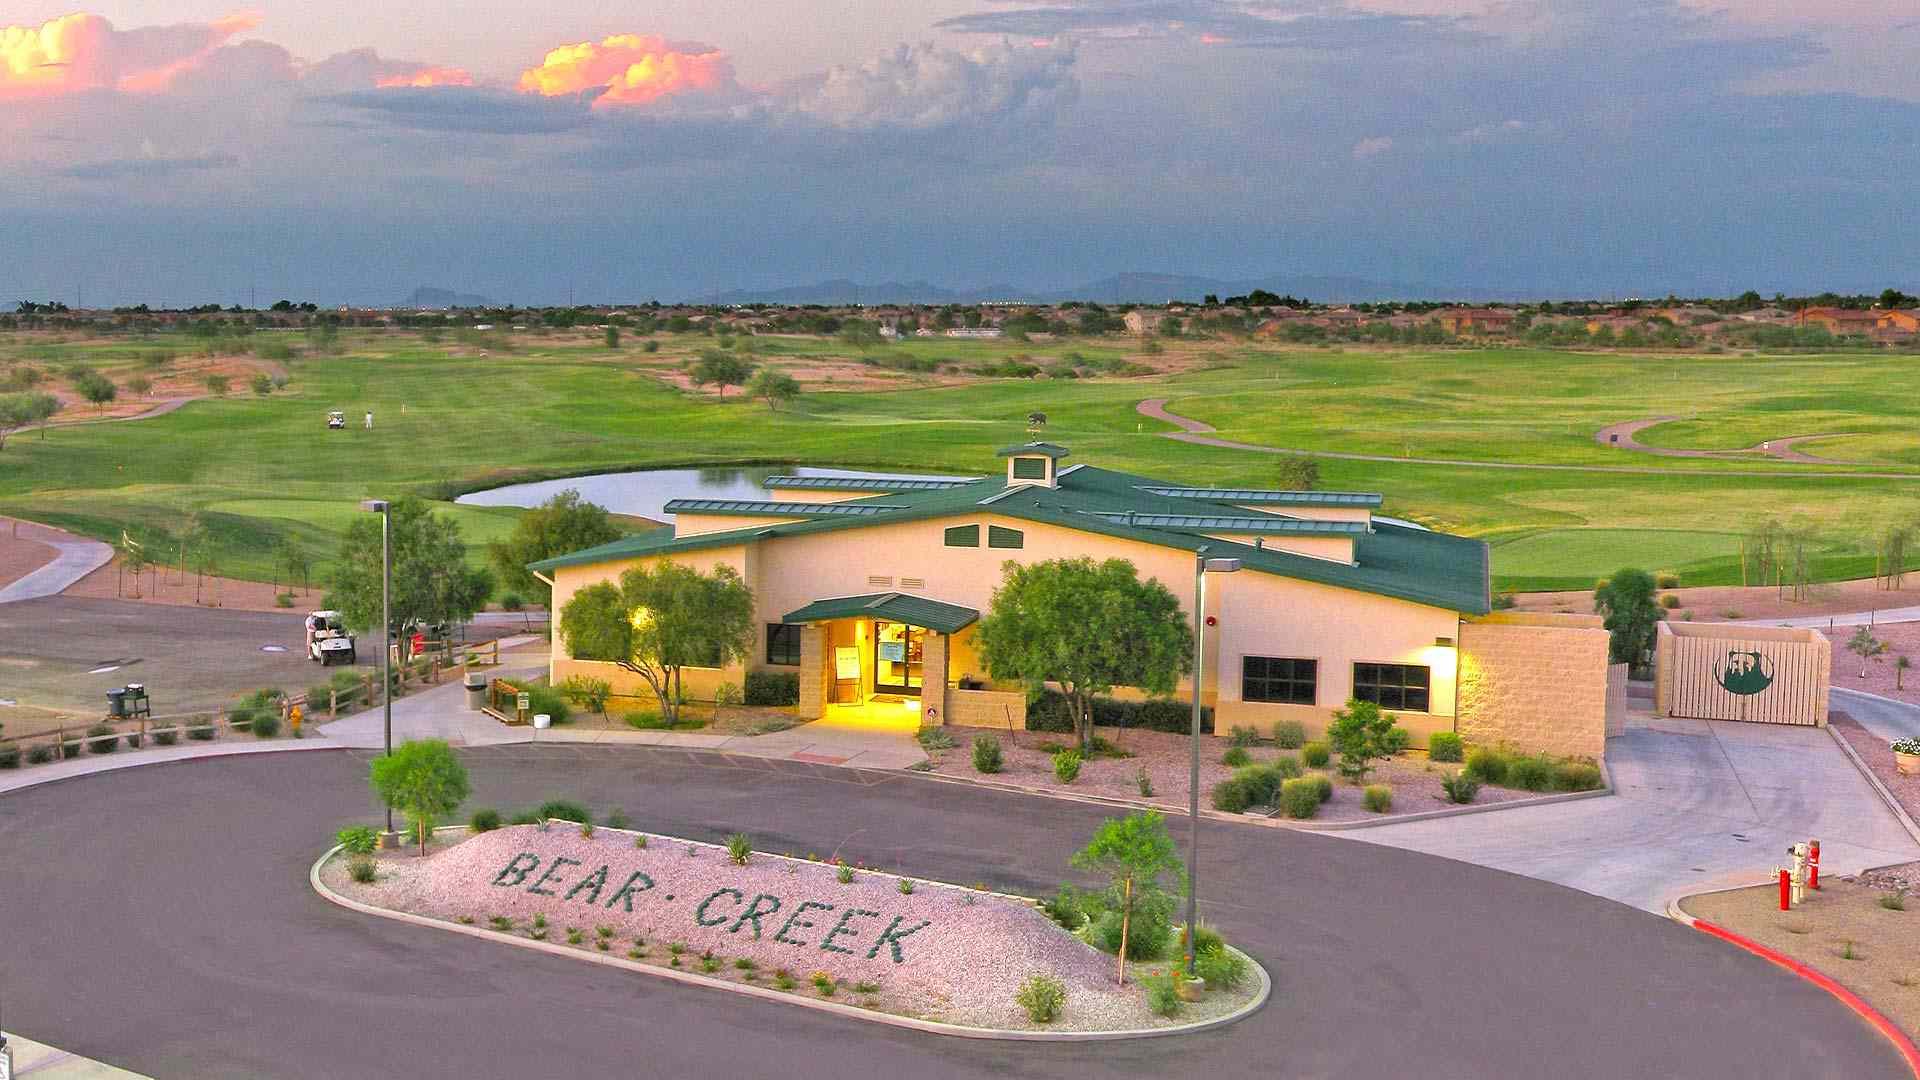 Bear Creek Golf Course